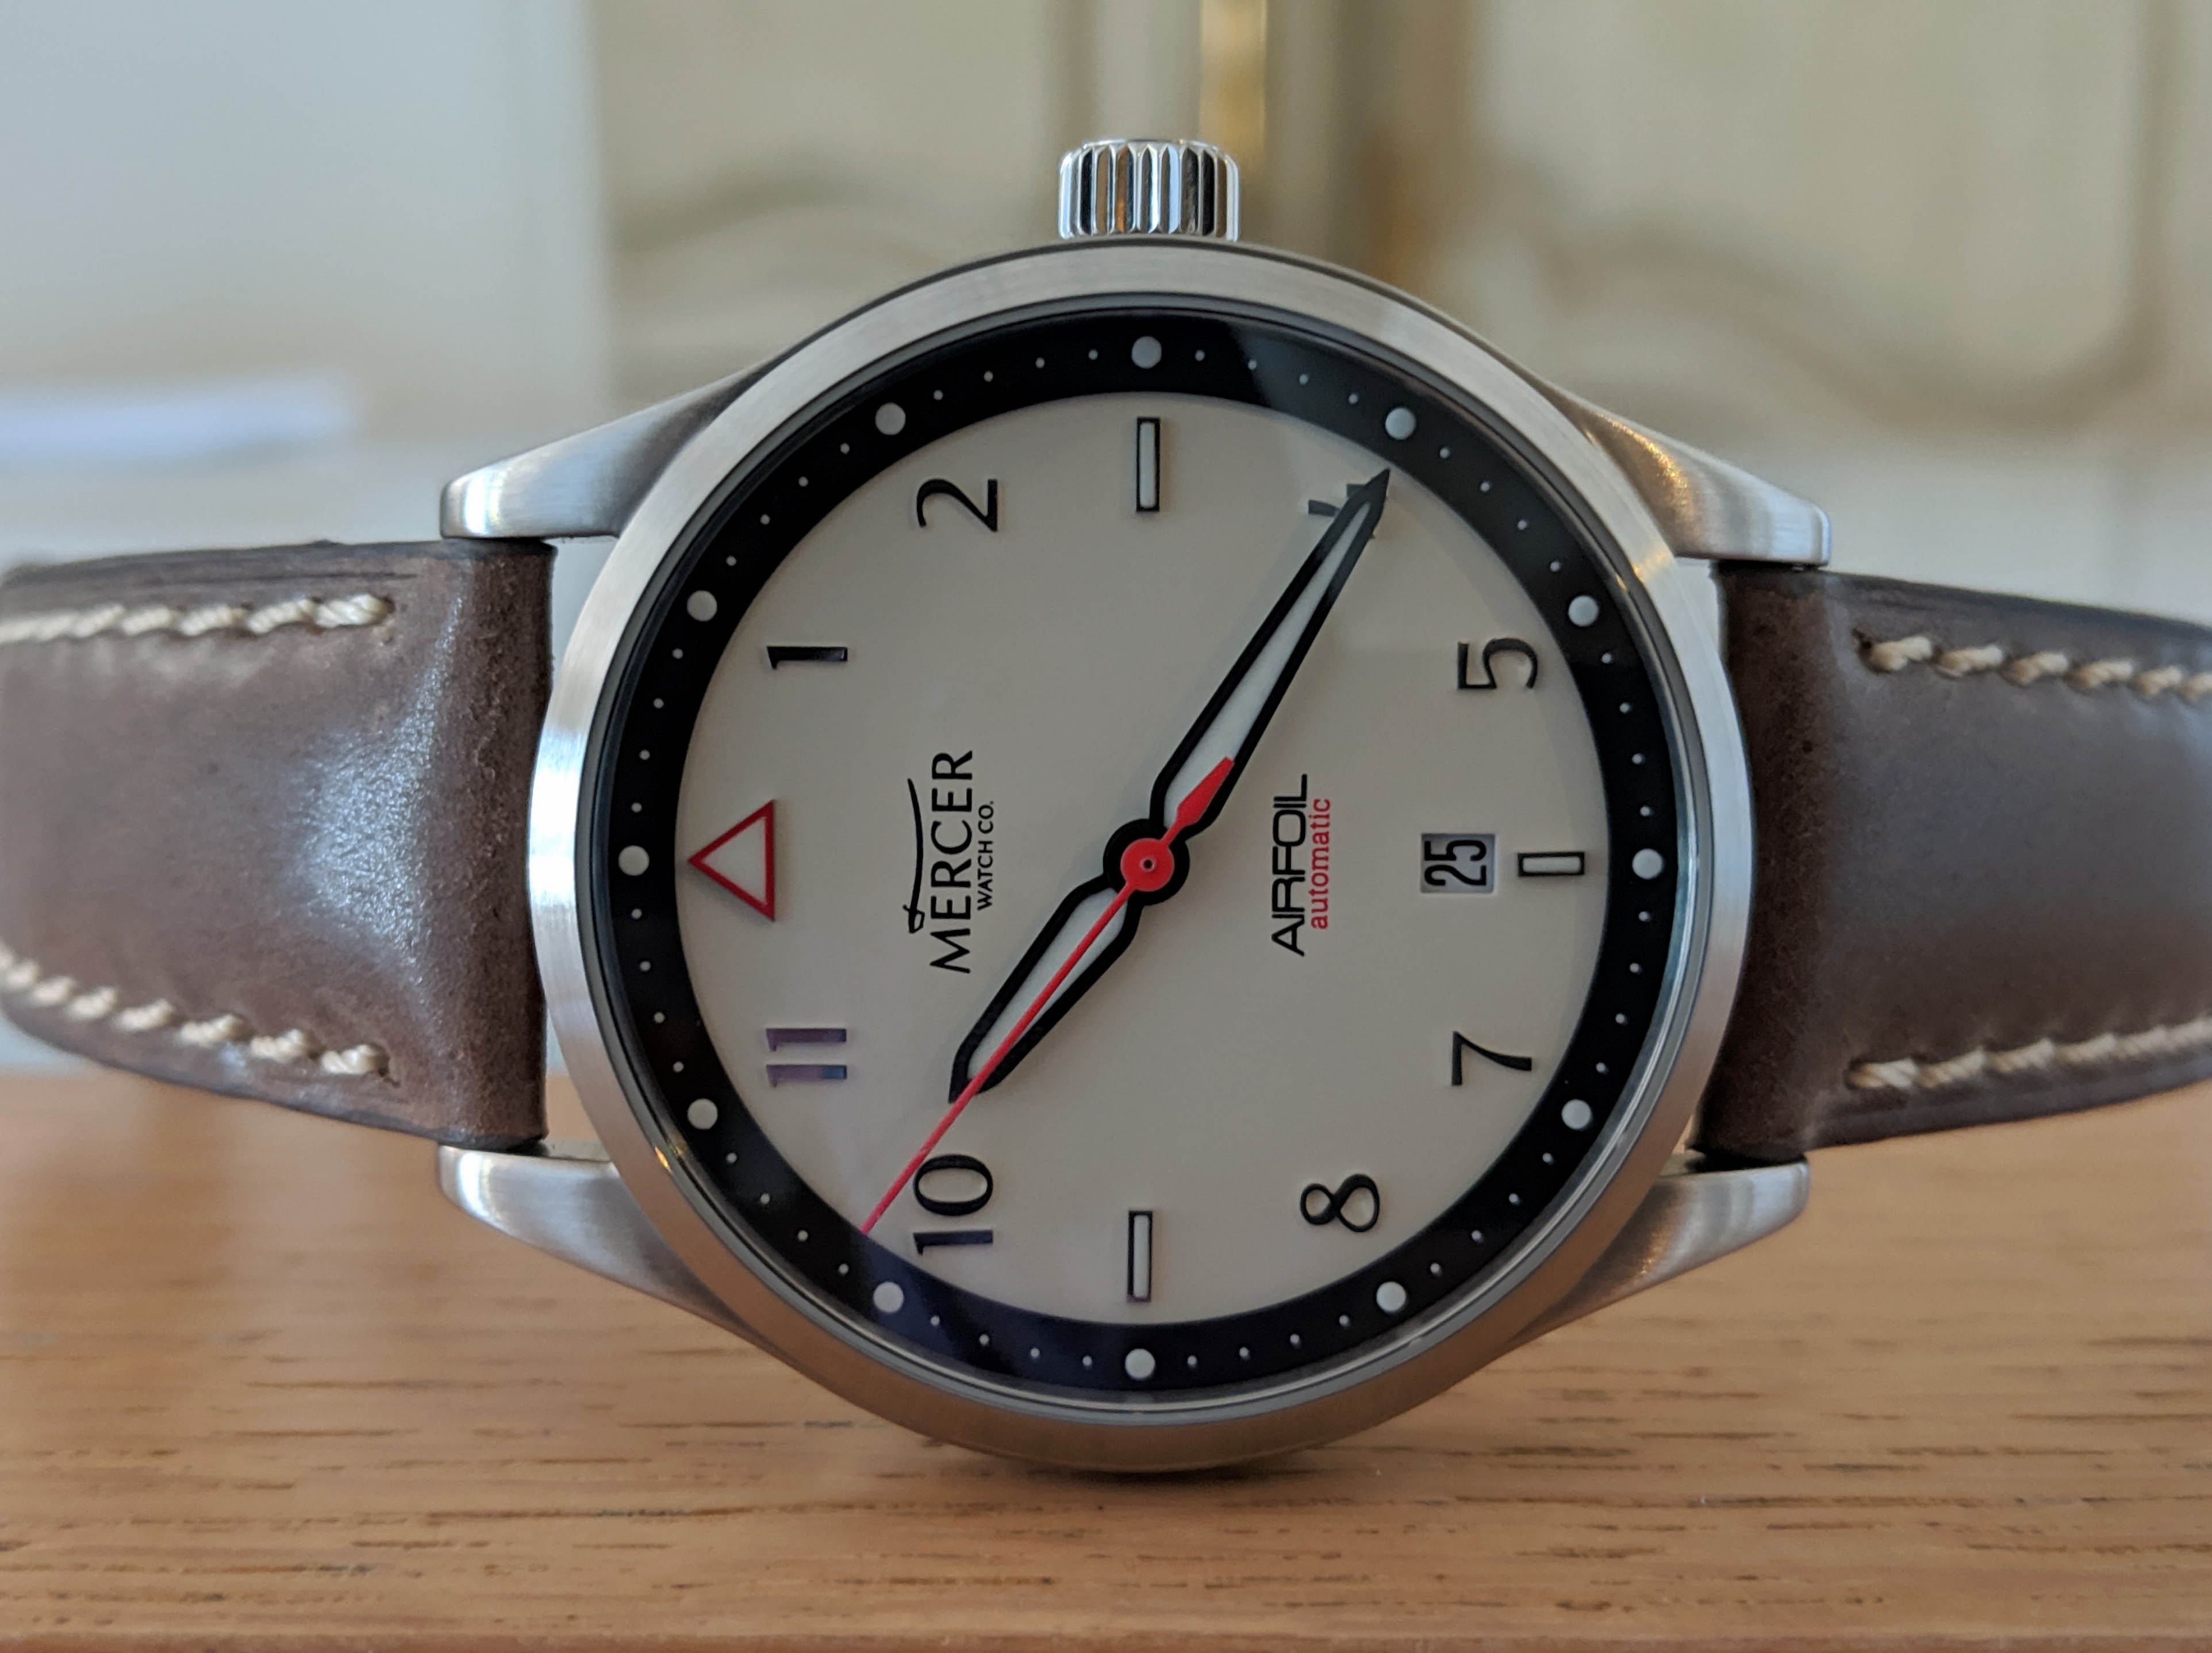 Mercer Airfoil Automatic Pilot Watch - Value Proposition - 9